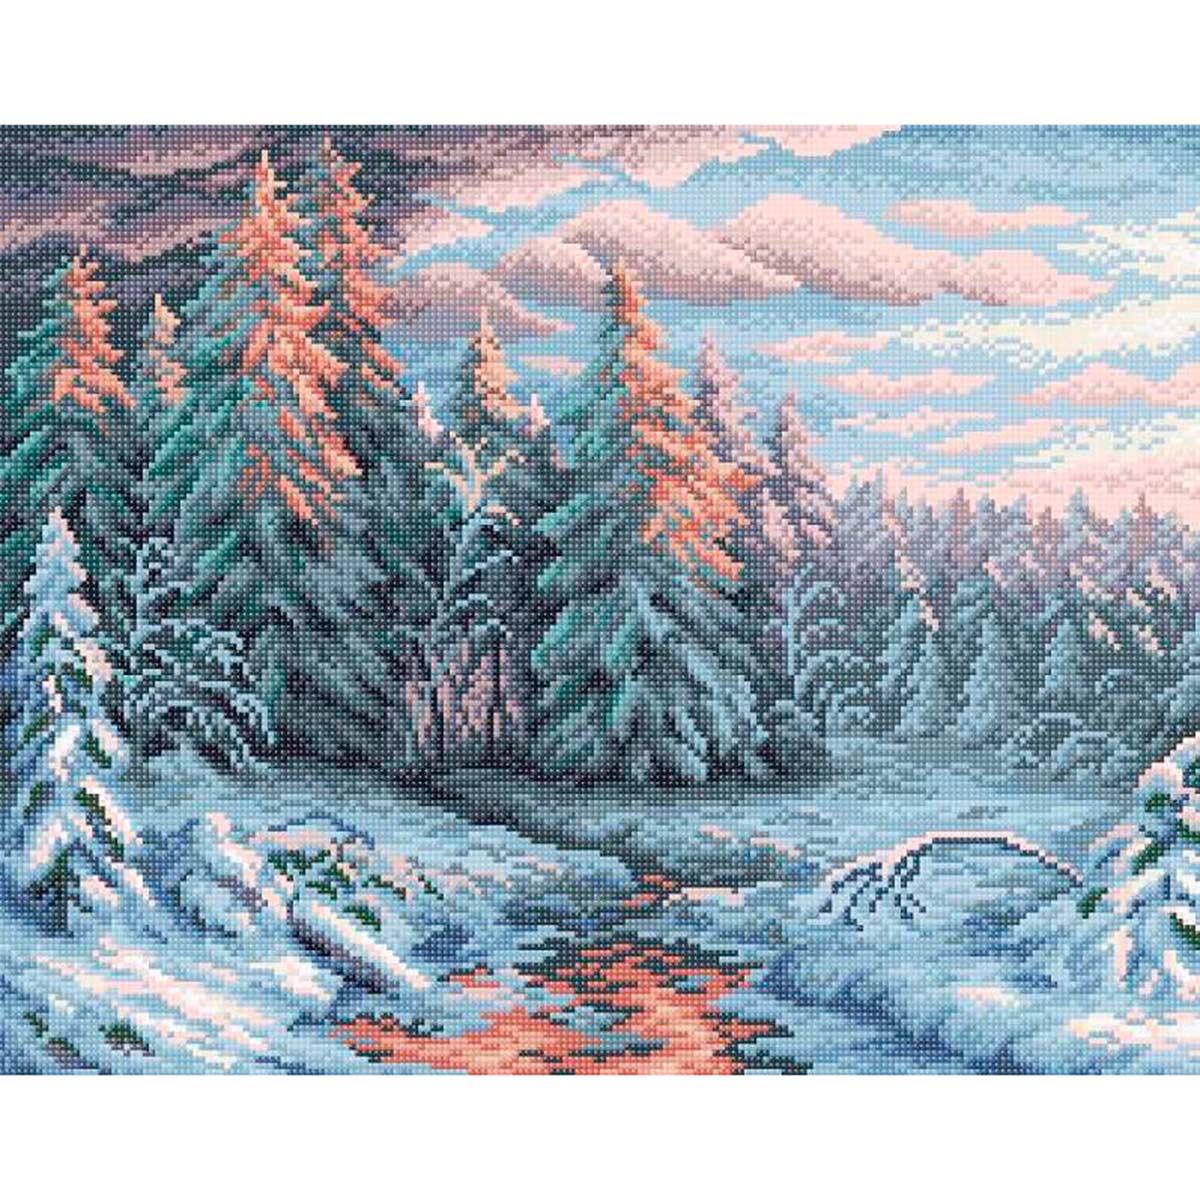 МС 004 Алмазная мозаика 'Зимний закат'48*38см Brilliart